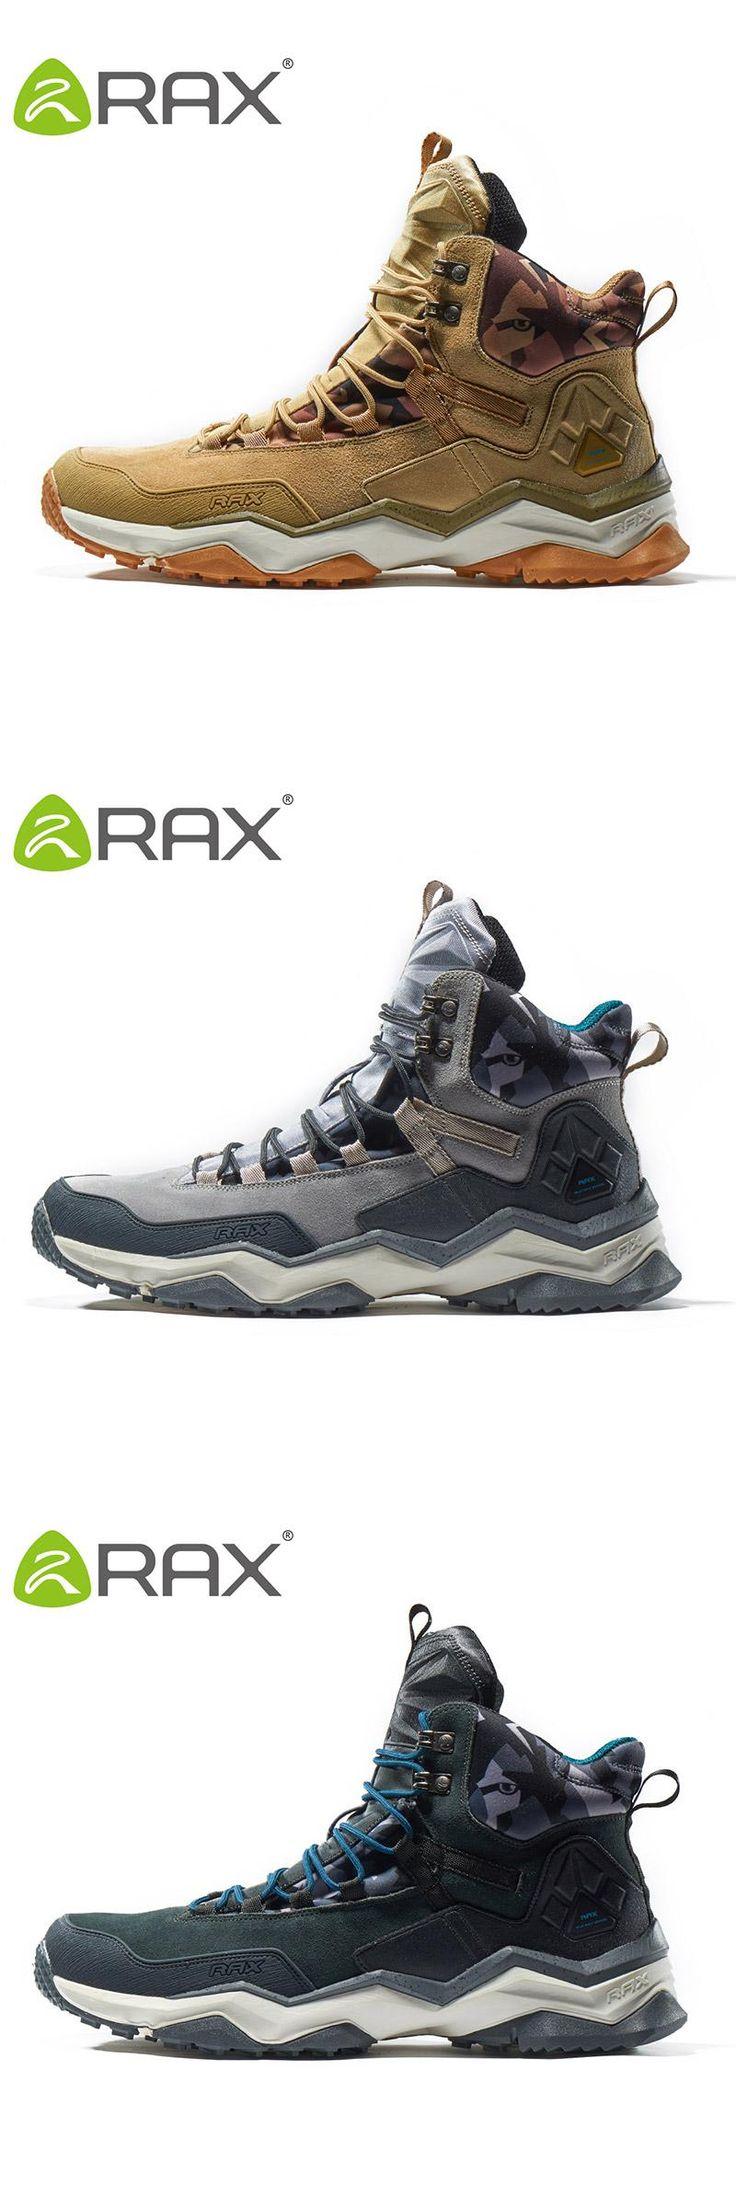 [Visit to Buy] RAX 2017 Waterproof Hiking Shoes For Men Winter Hiking Boots Men Outdoor Boots Climbing Walking Mountaineering Trekking Shoes #Advertisement